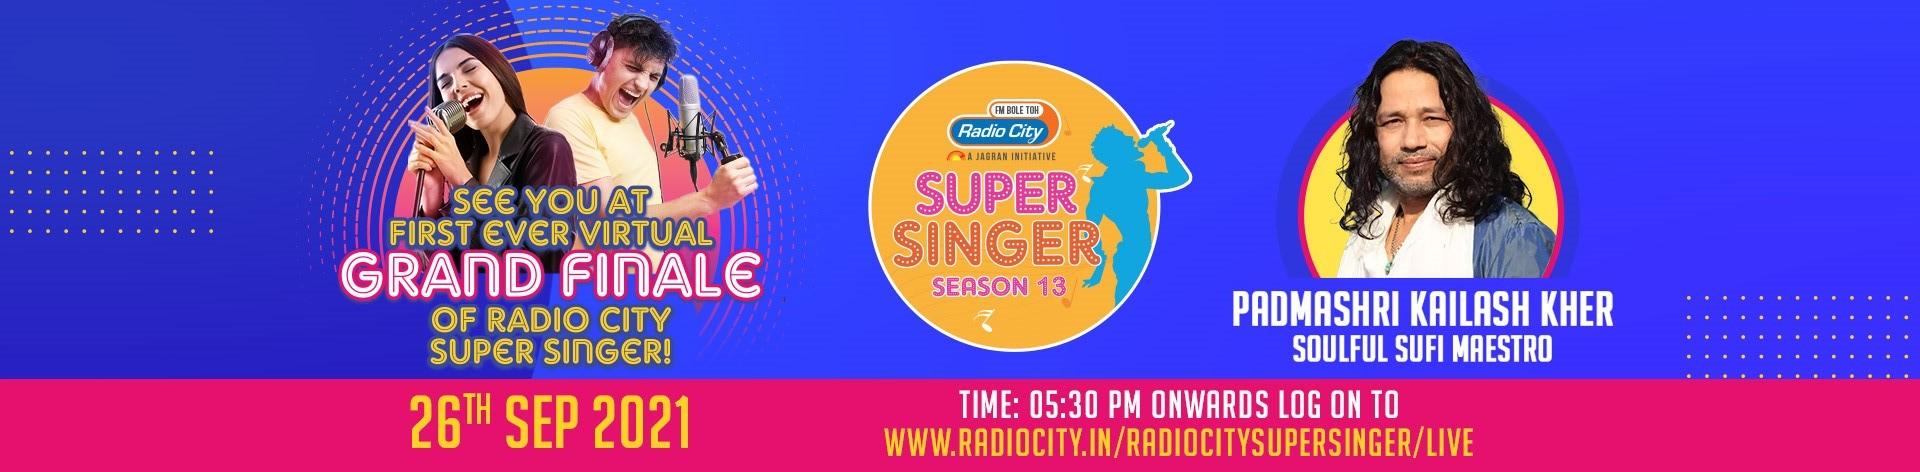 Radiocity super singer banner